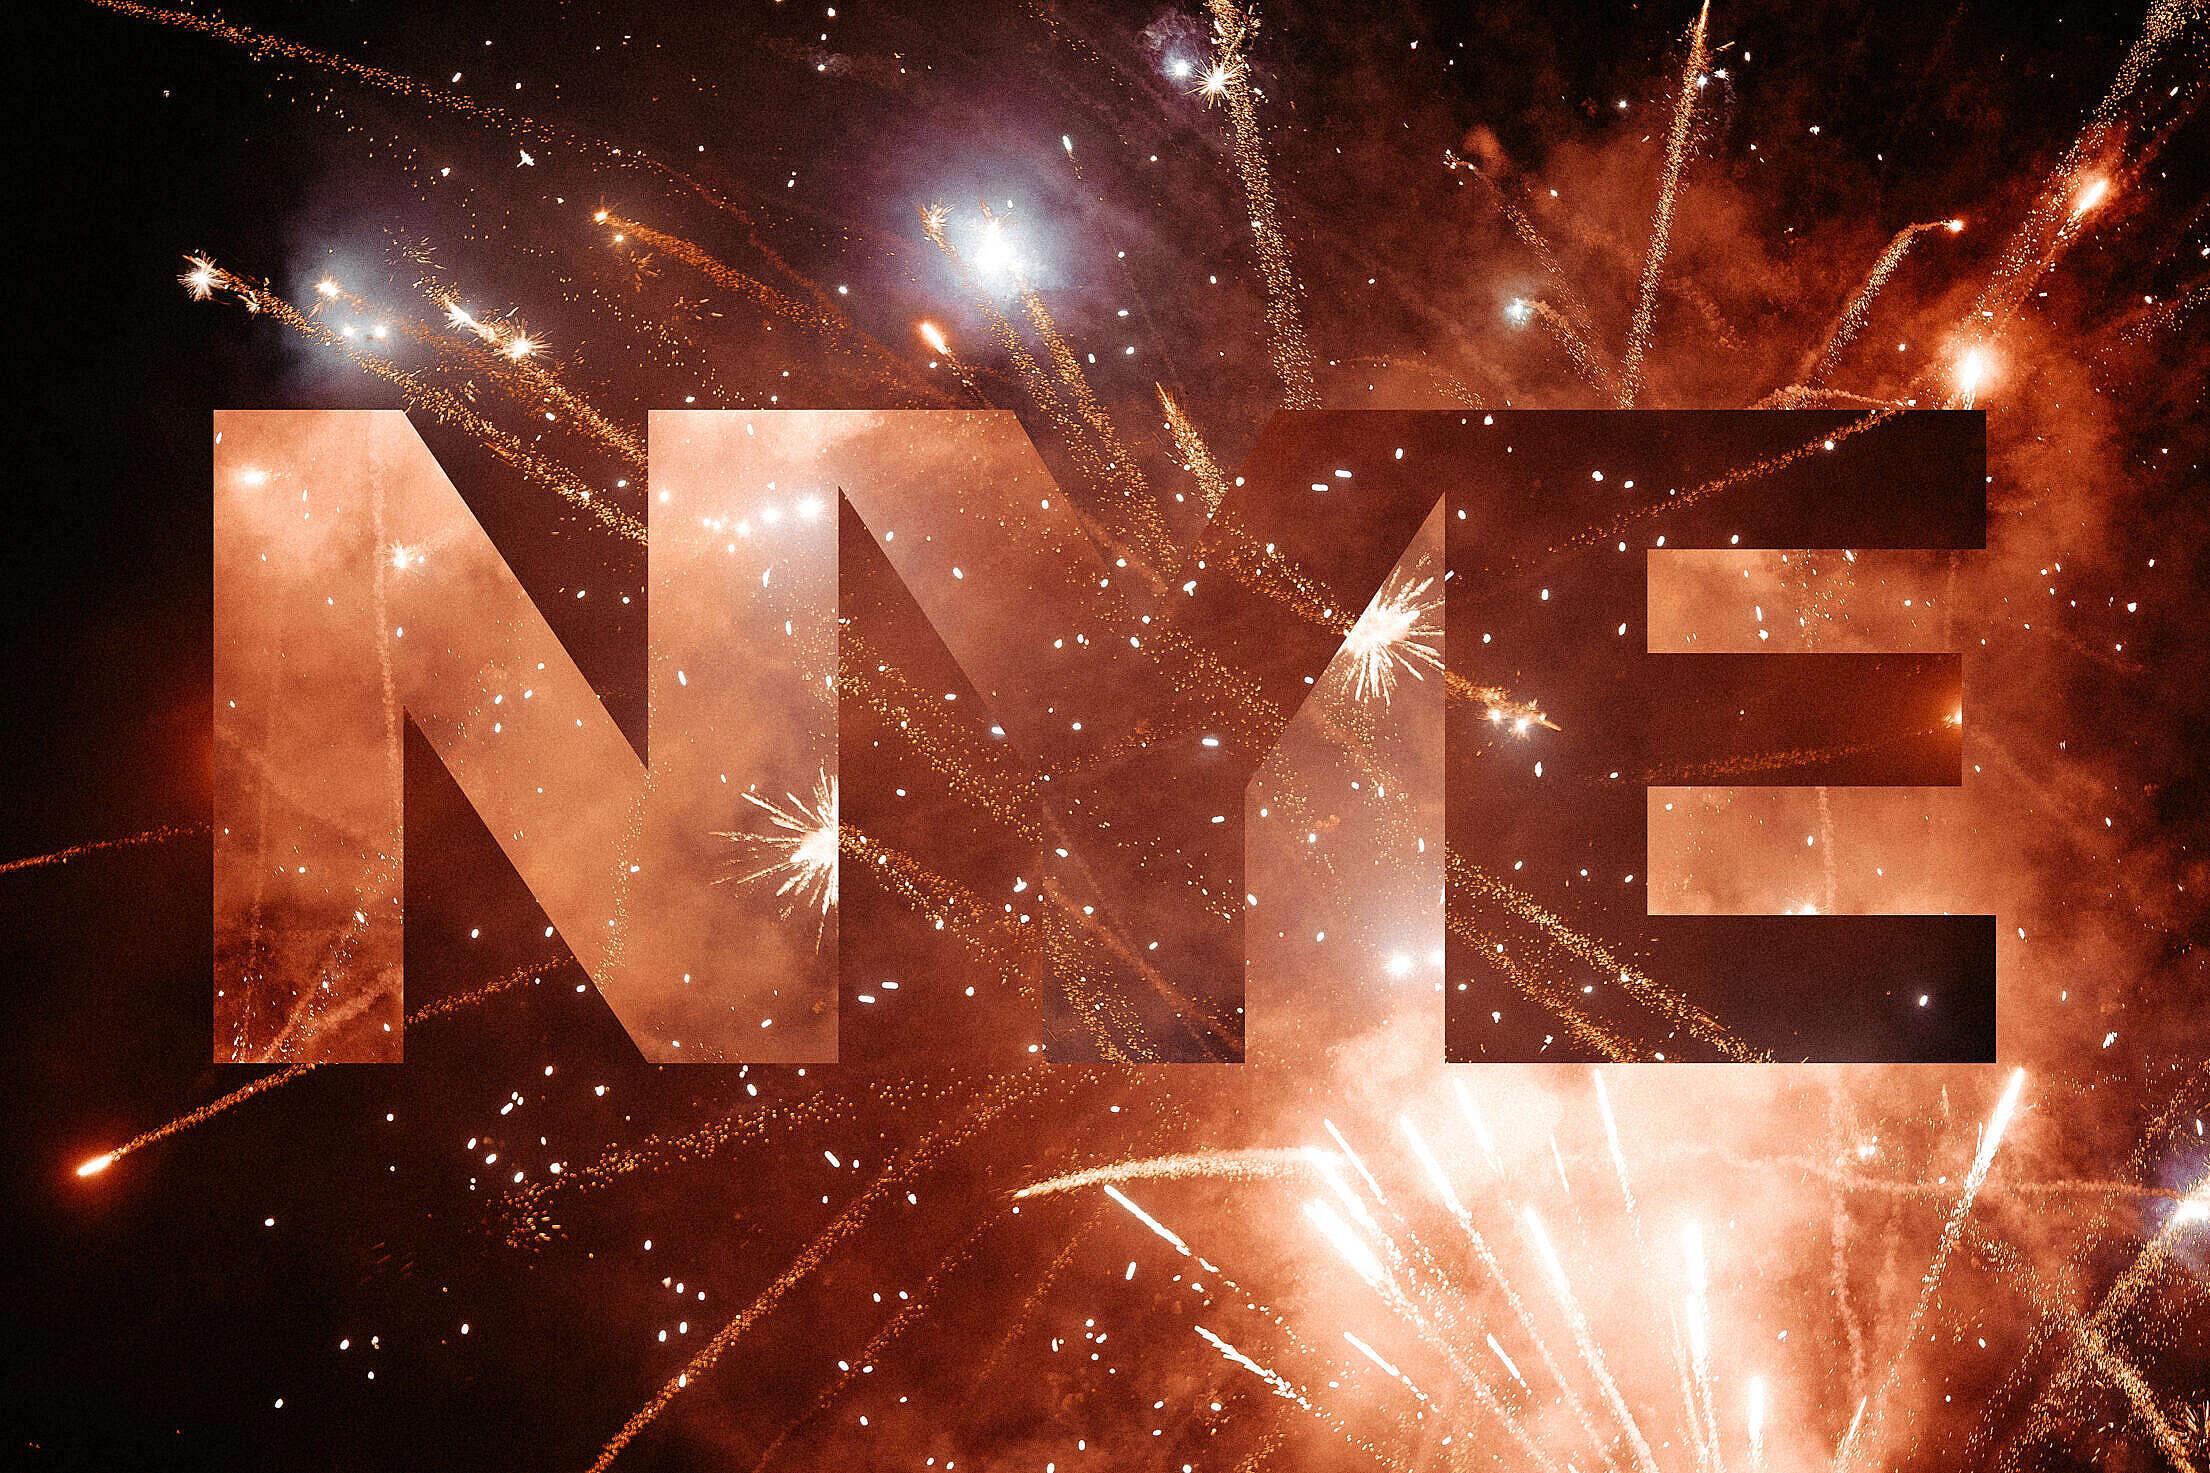 NYE New Years Eve Free Stock Photo